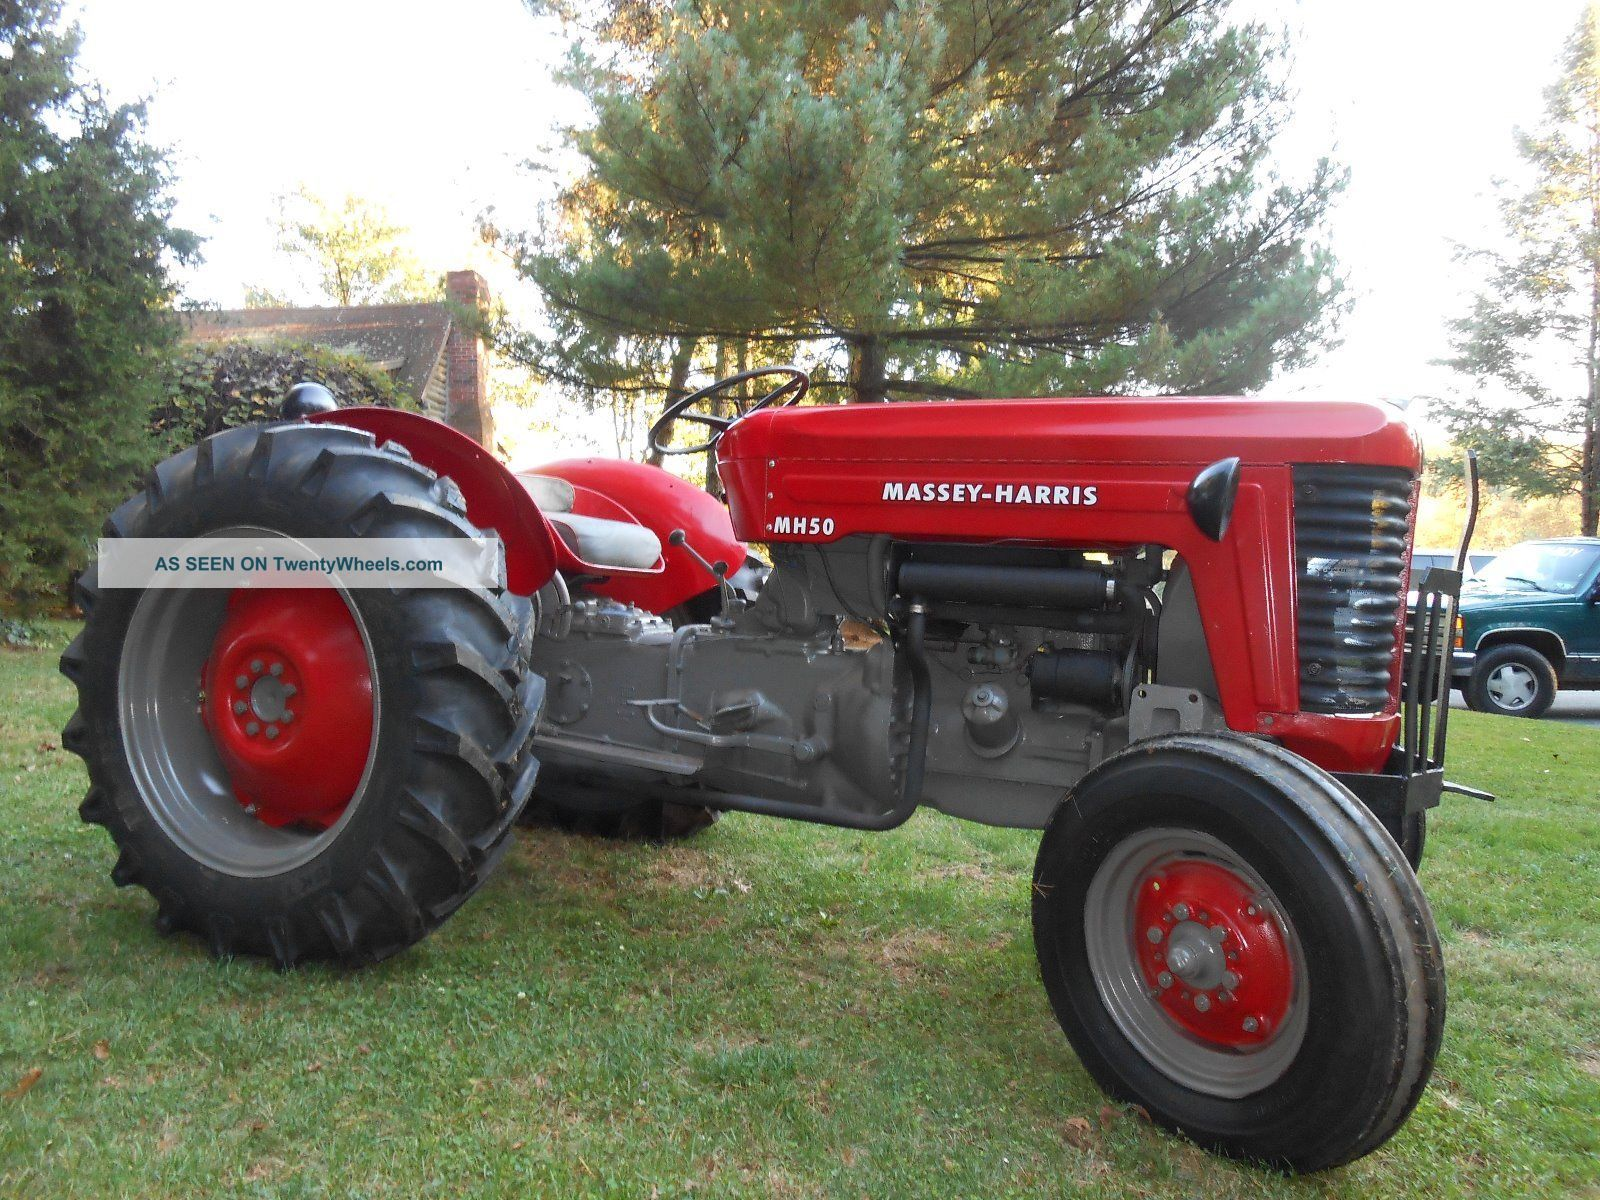 Massey Harris Tractor : Massey harris tractor